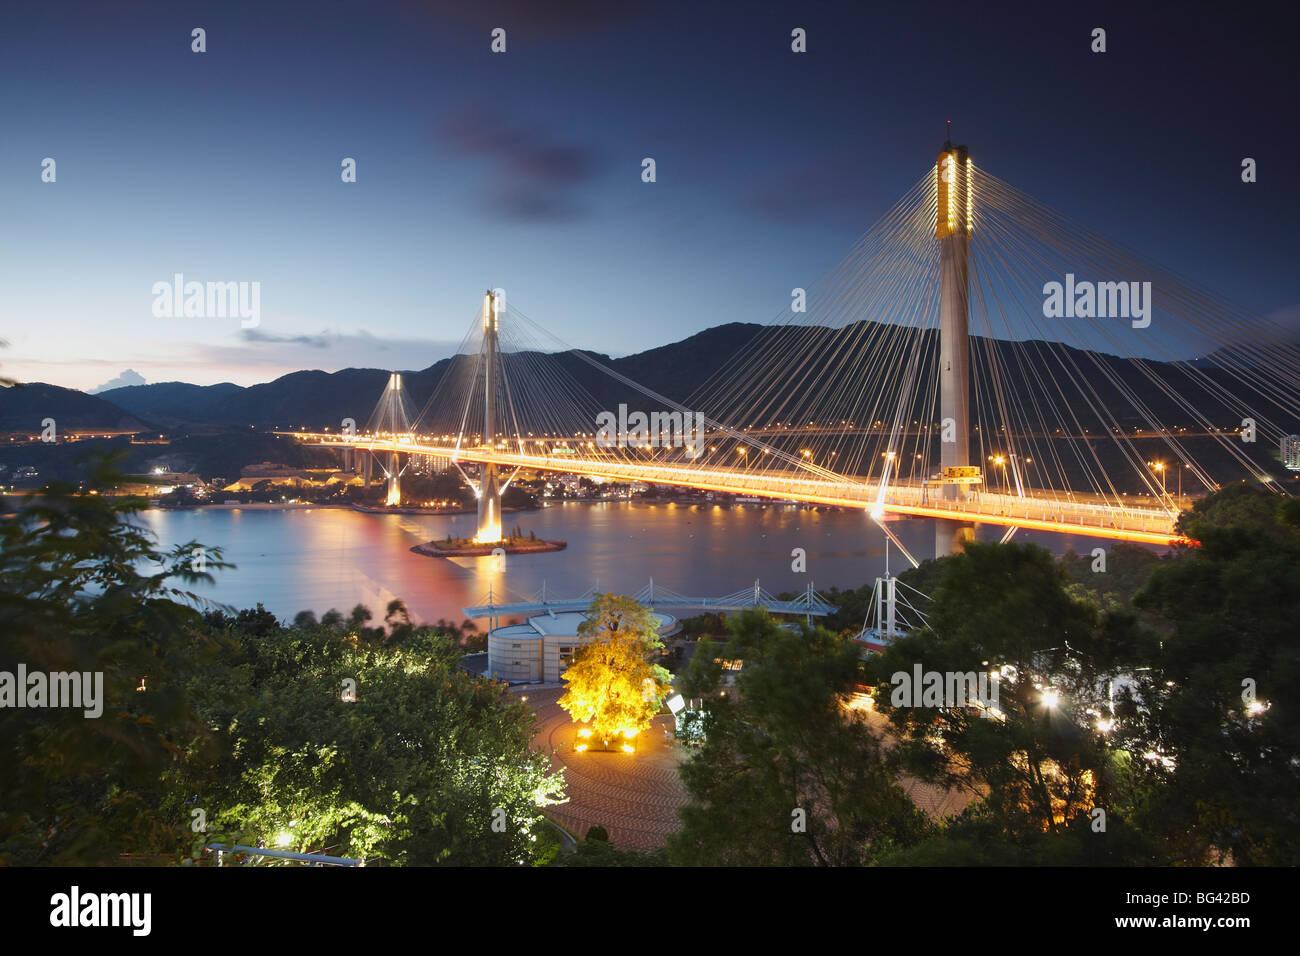 Kap Shui Mun bridge at dusk, Tsing Yi, Hong Kong, China, Asia - Stock Image